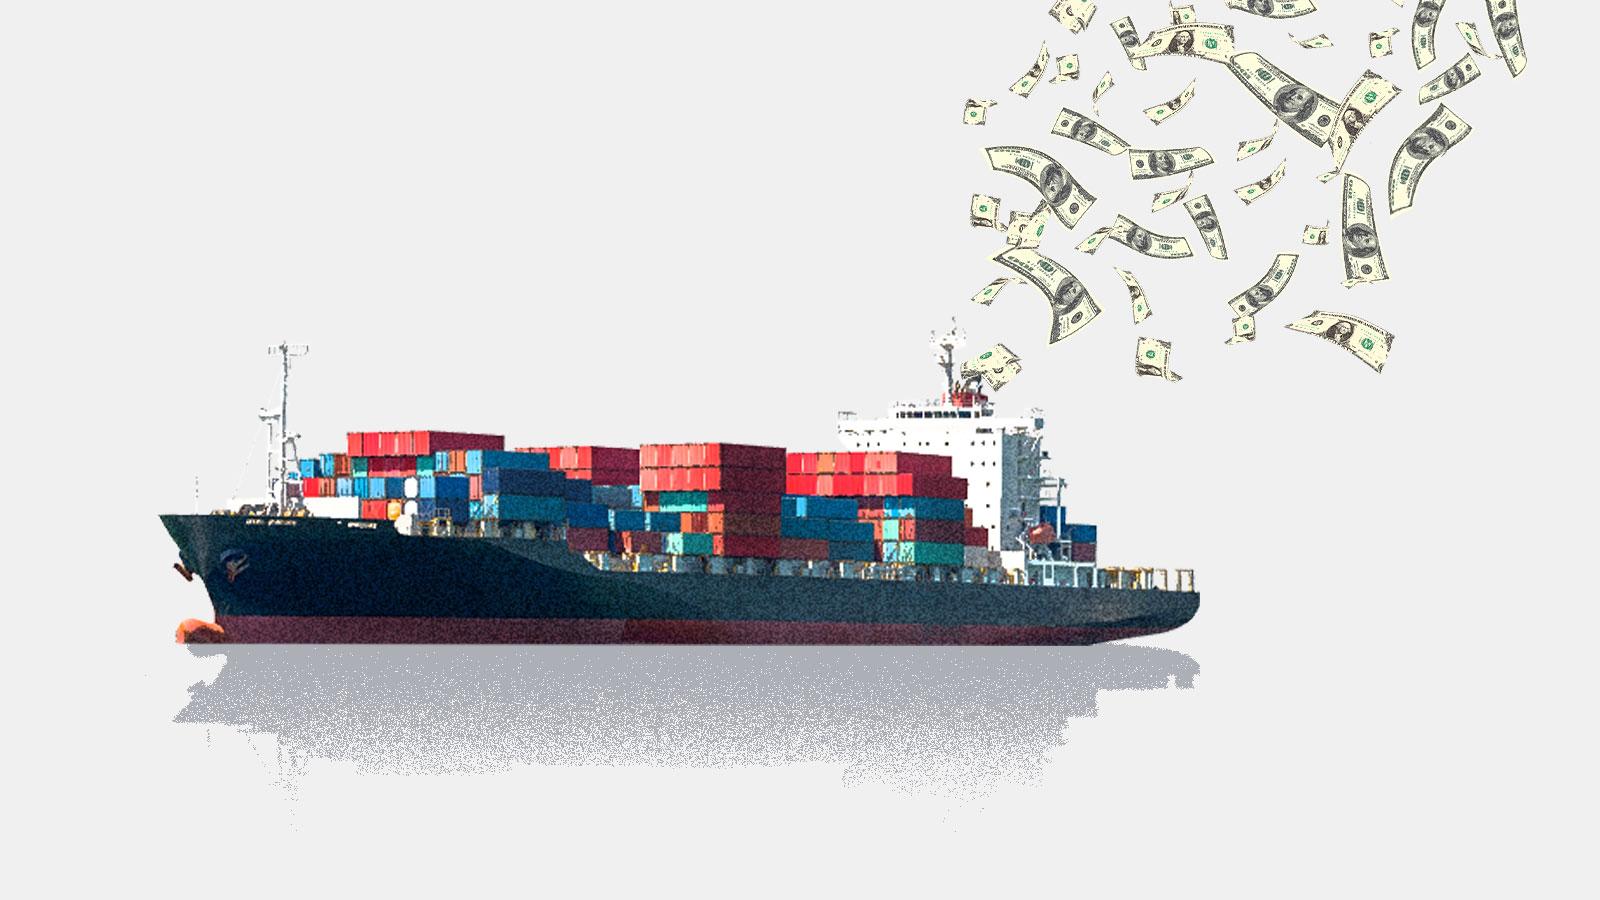 A cargo ship belching money out of a smokestack